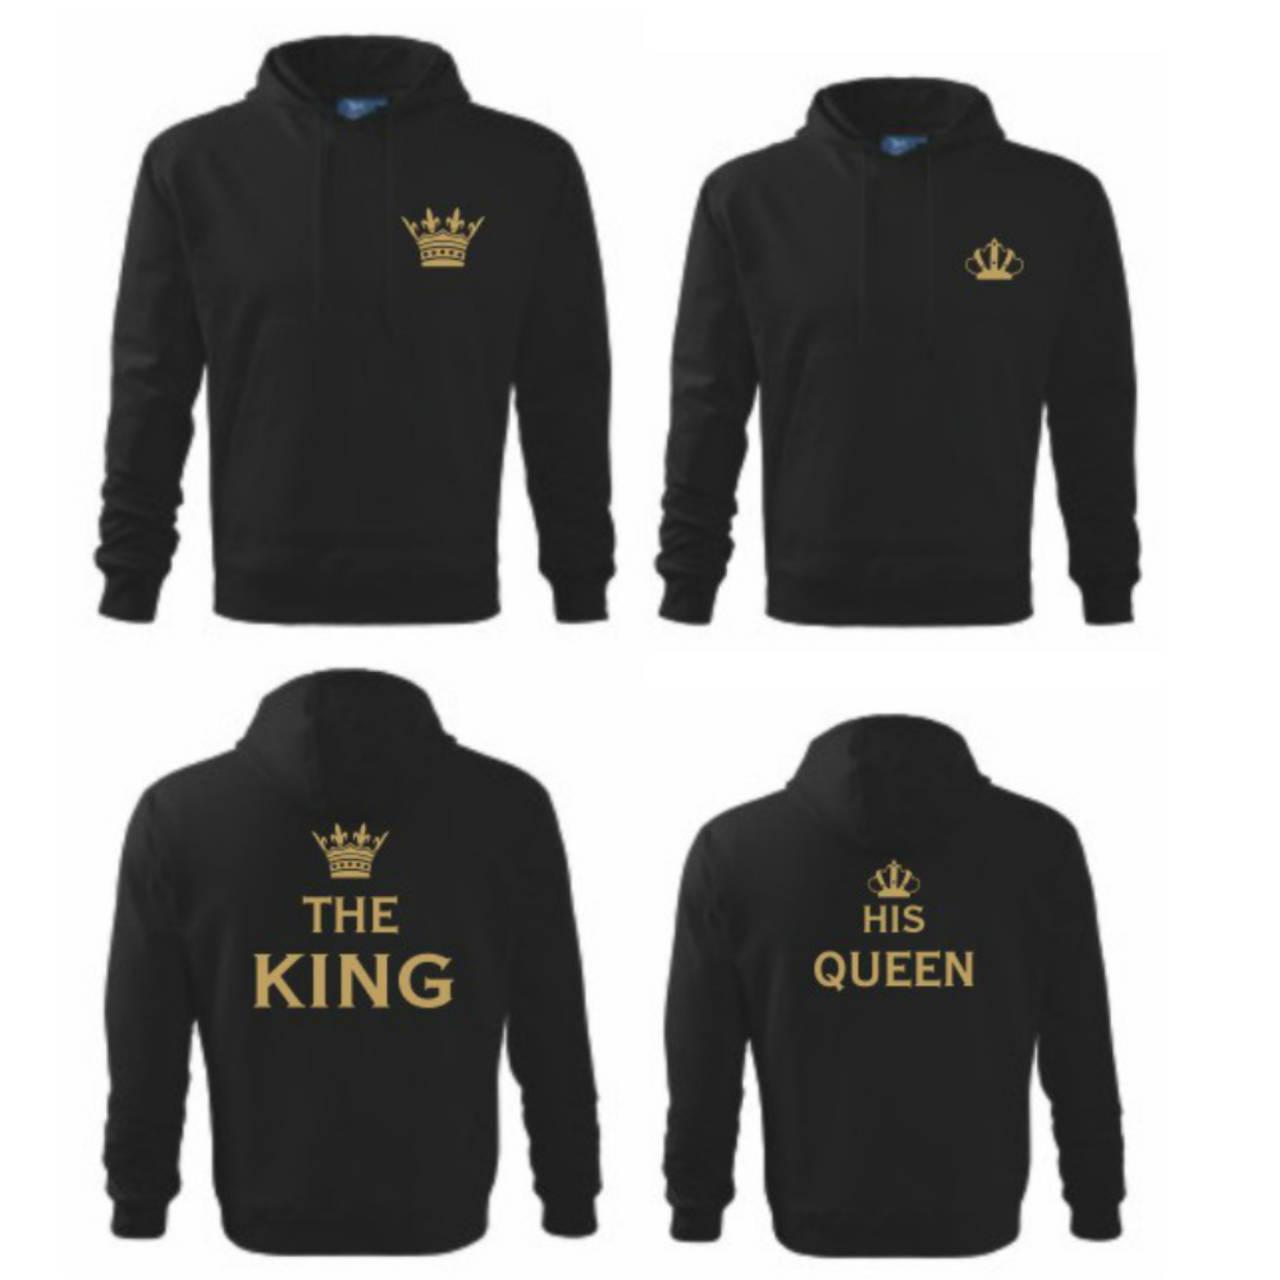 2126aa06c King a Queen - zaľúbené mikiny pre pár / trickoland - SAShE.sk ...